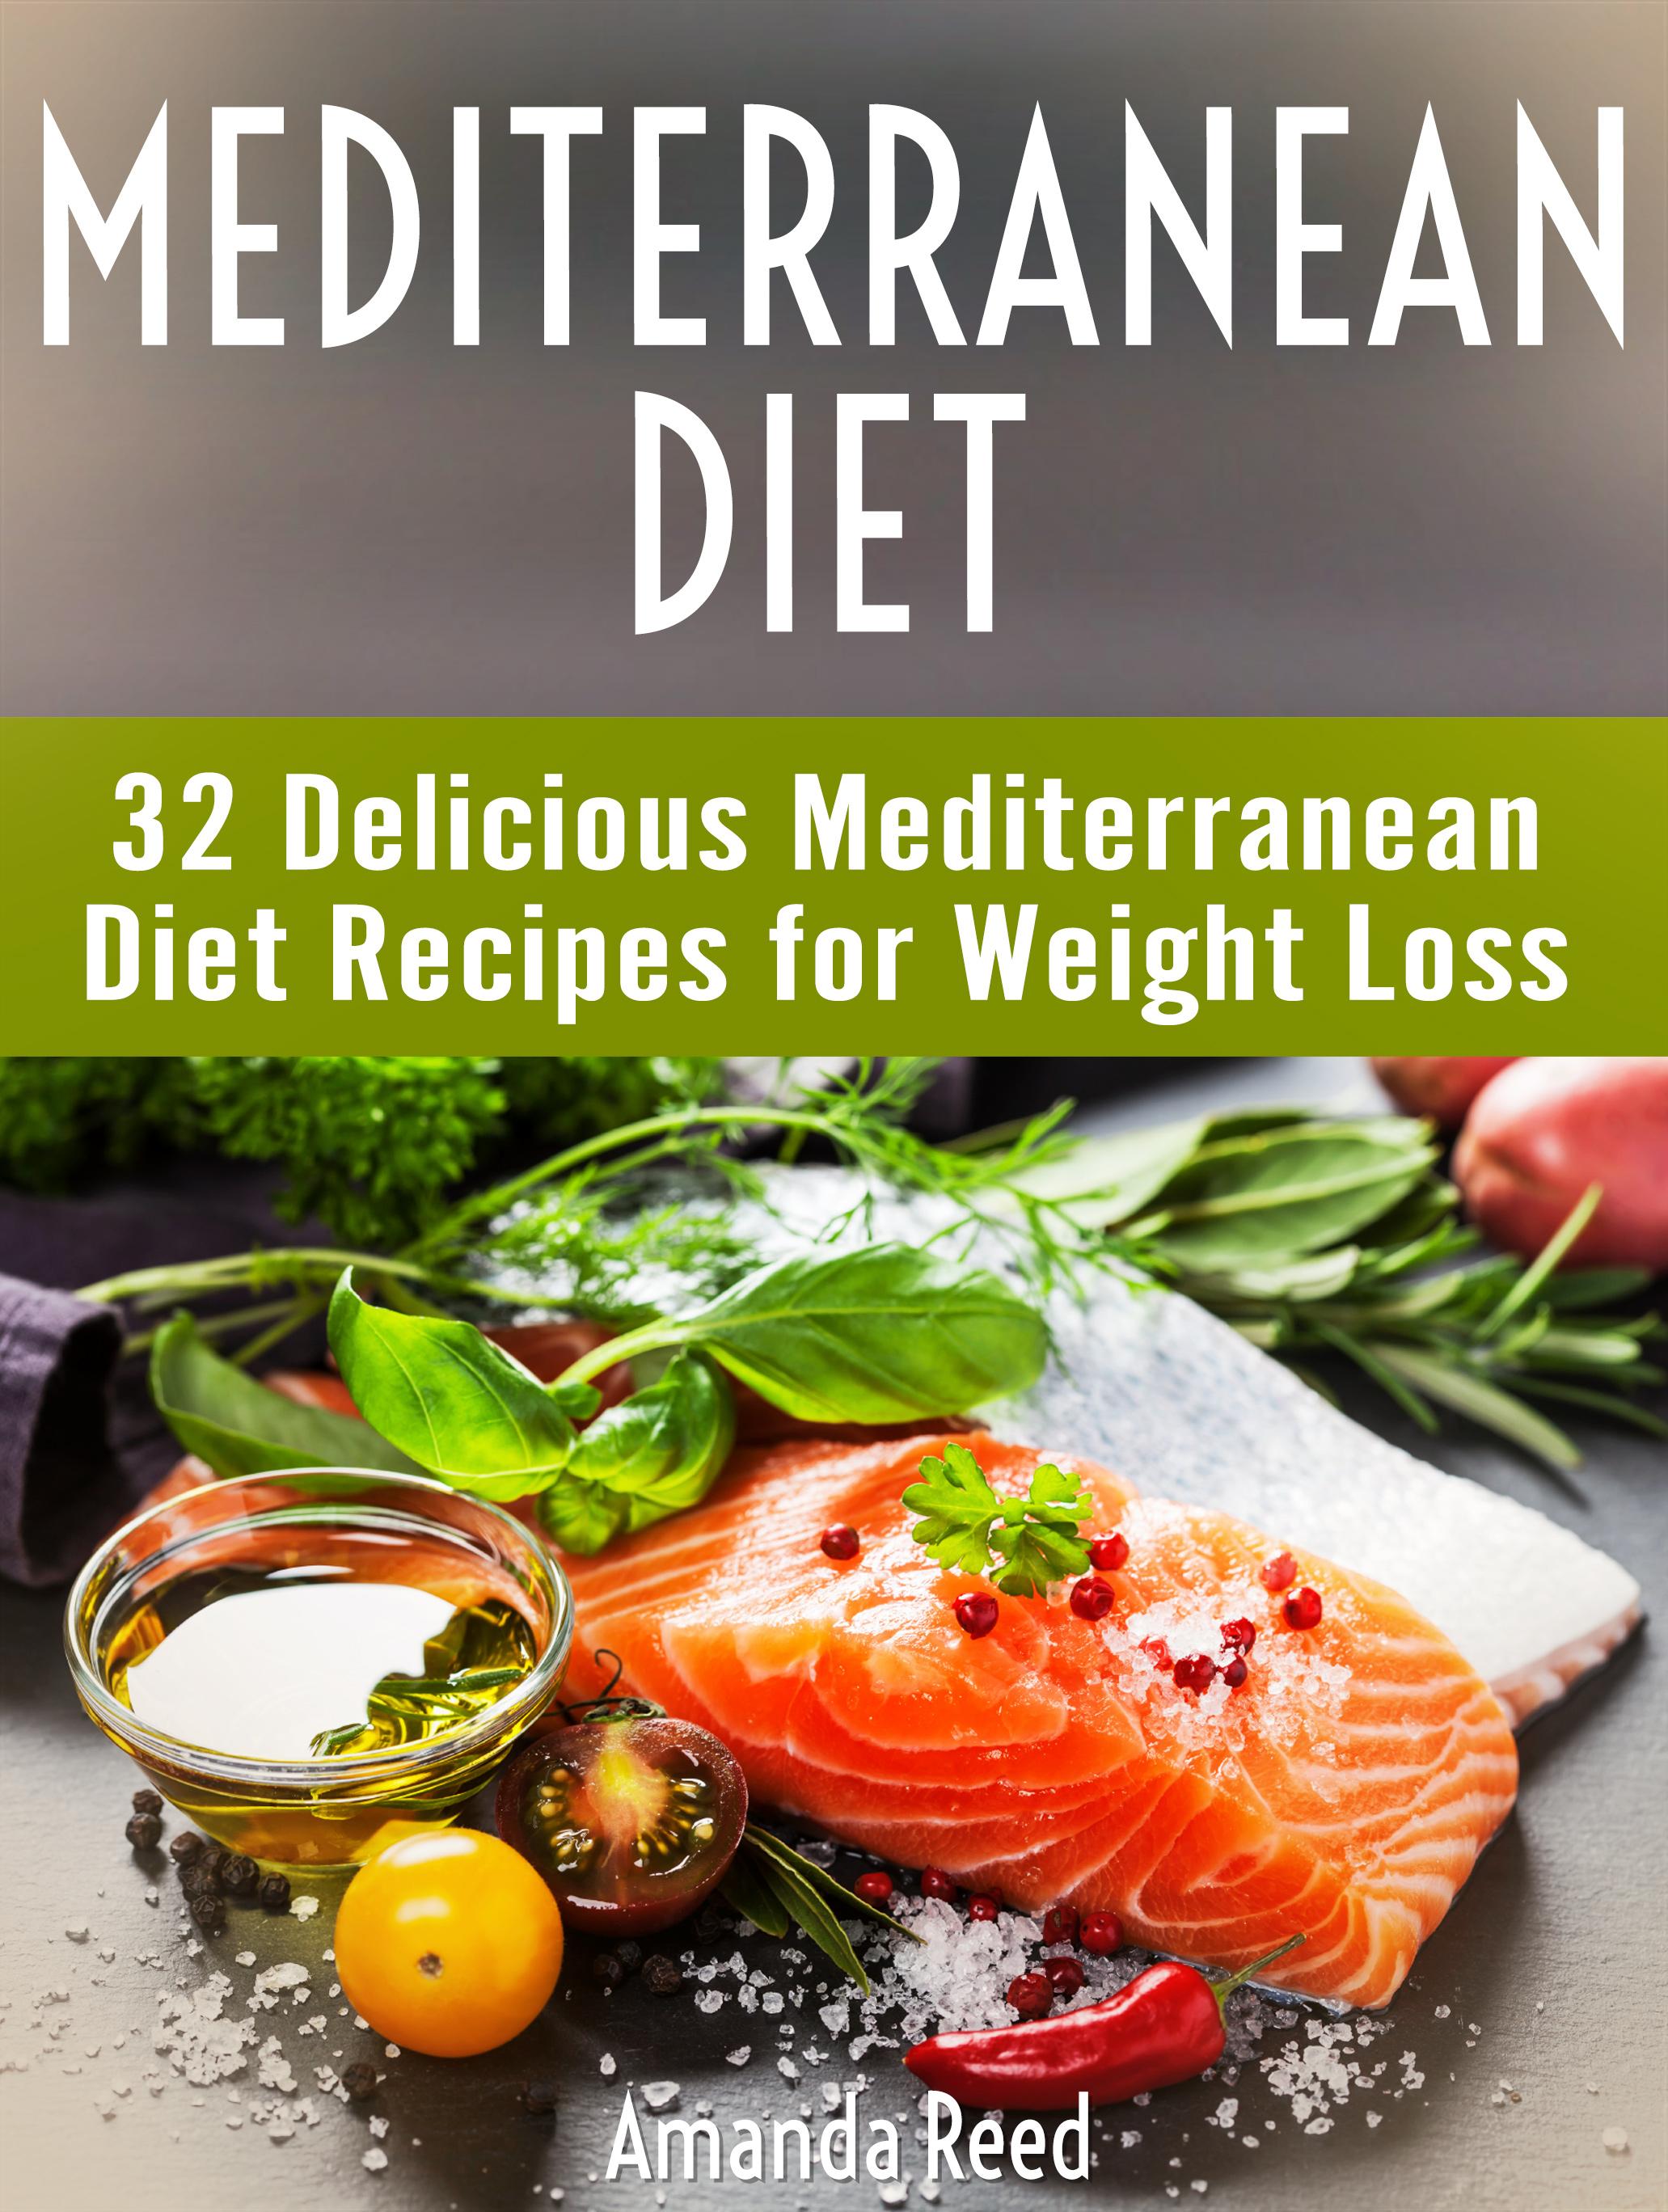 Mediterranean Diet: 32 Delicious Mediterranean Diet Recipes for Weight  Loss, an Ebook by Amanda Reed